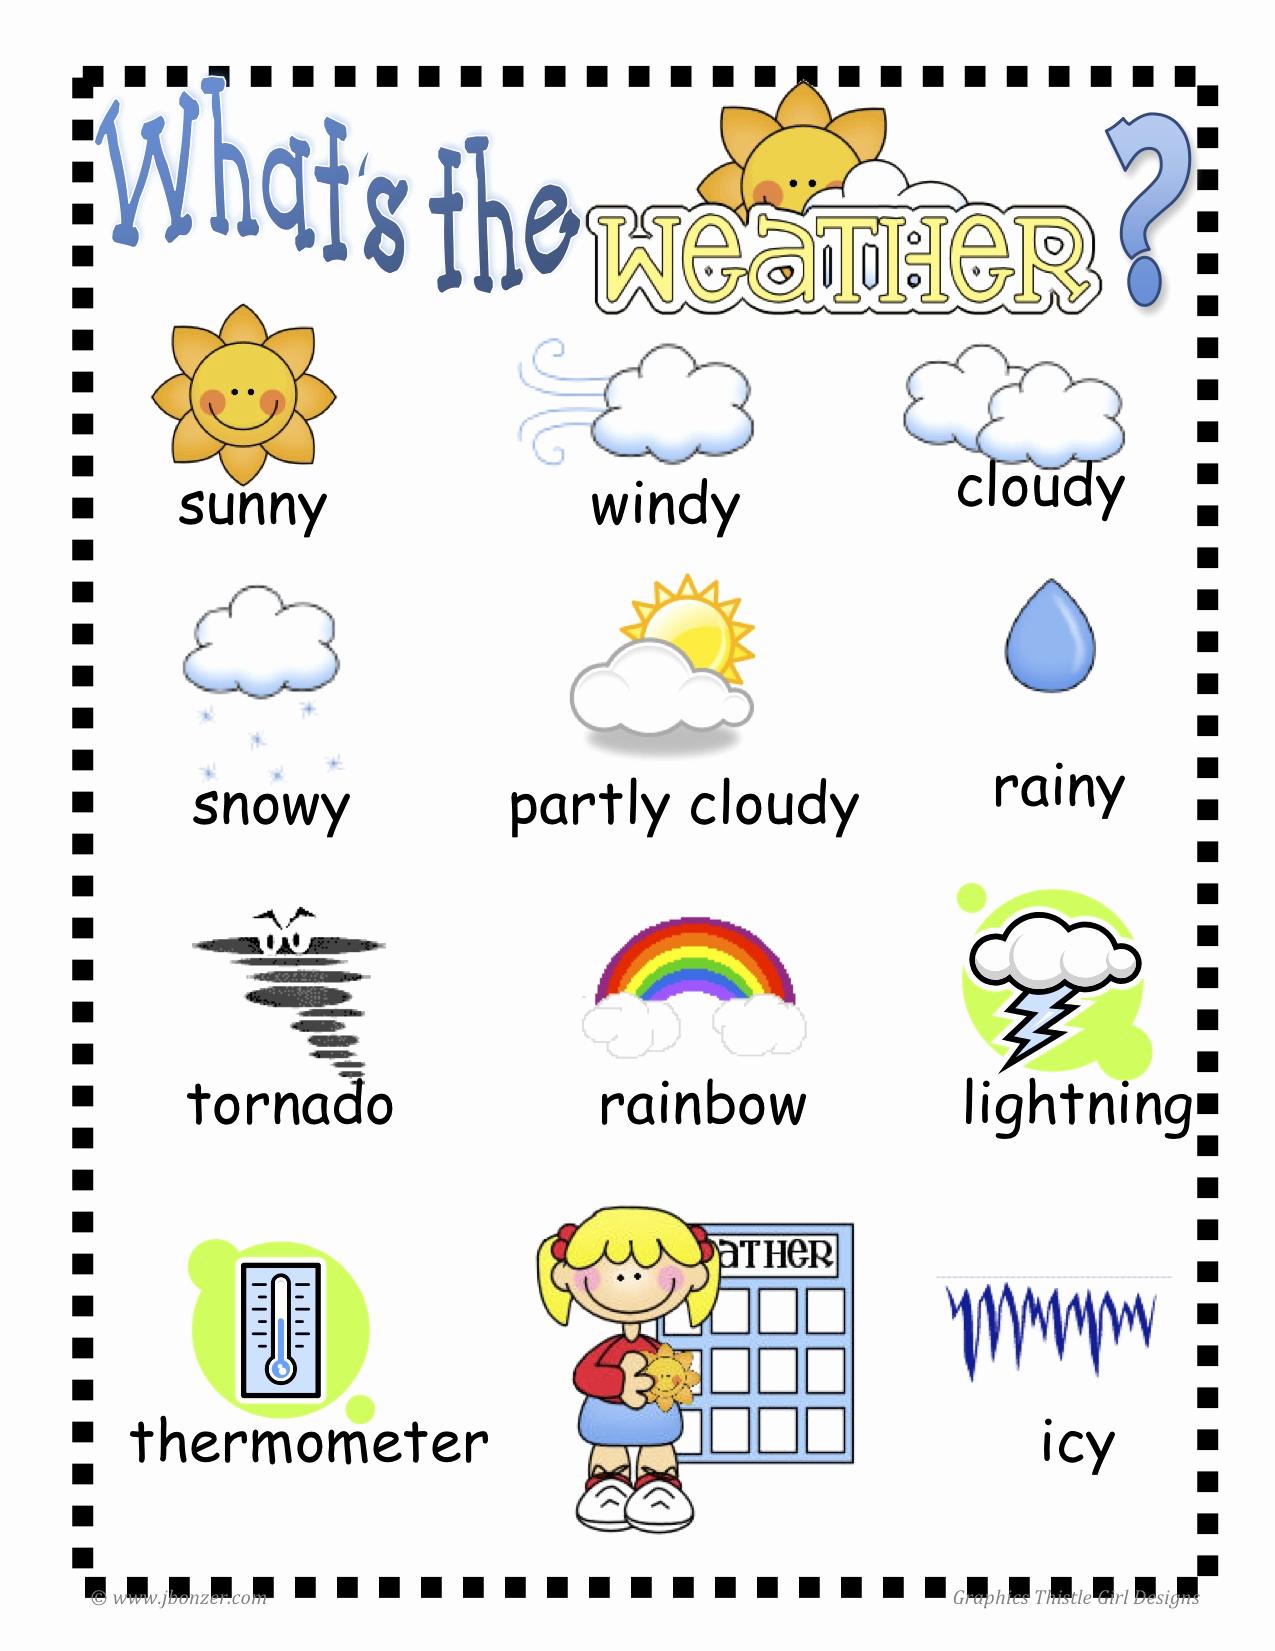 Weather tools Worksheet Beautiful Weather Worksheet New 798 Weather Instruments Printable